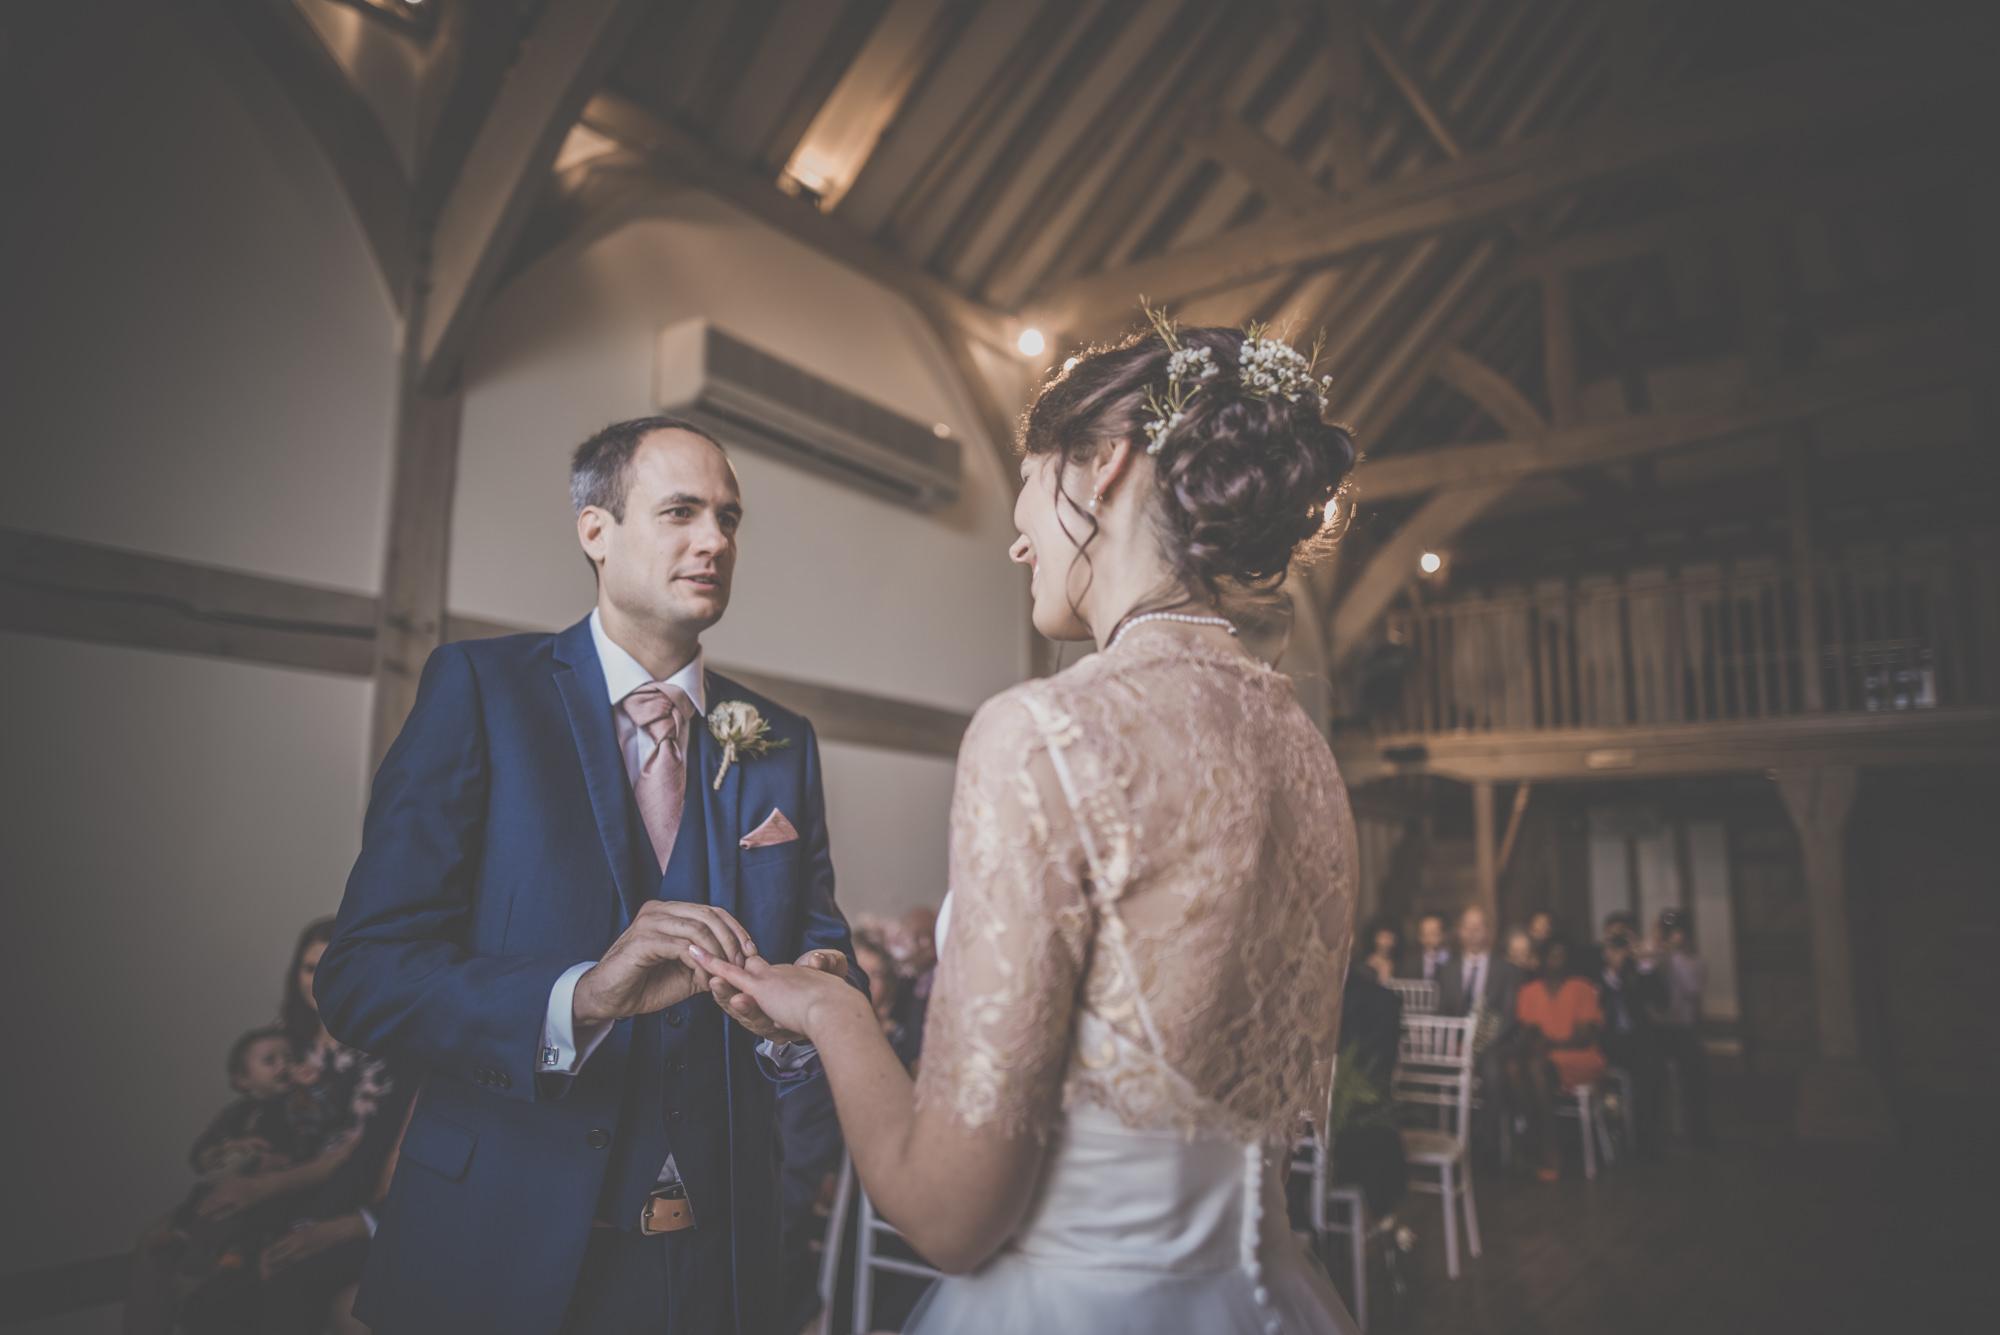 Charisse-and-James-wedding-in-Cain-Manor-Venue-Hampshire-Manu-Mendoza-Wedding-Photography-267.jpg